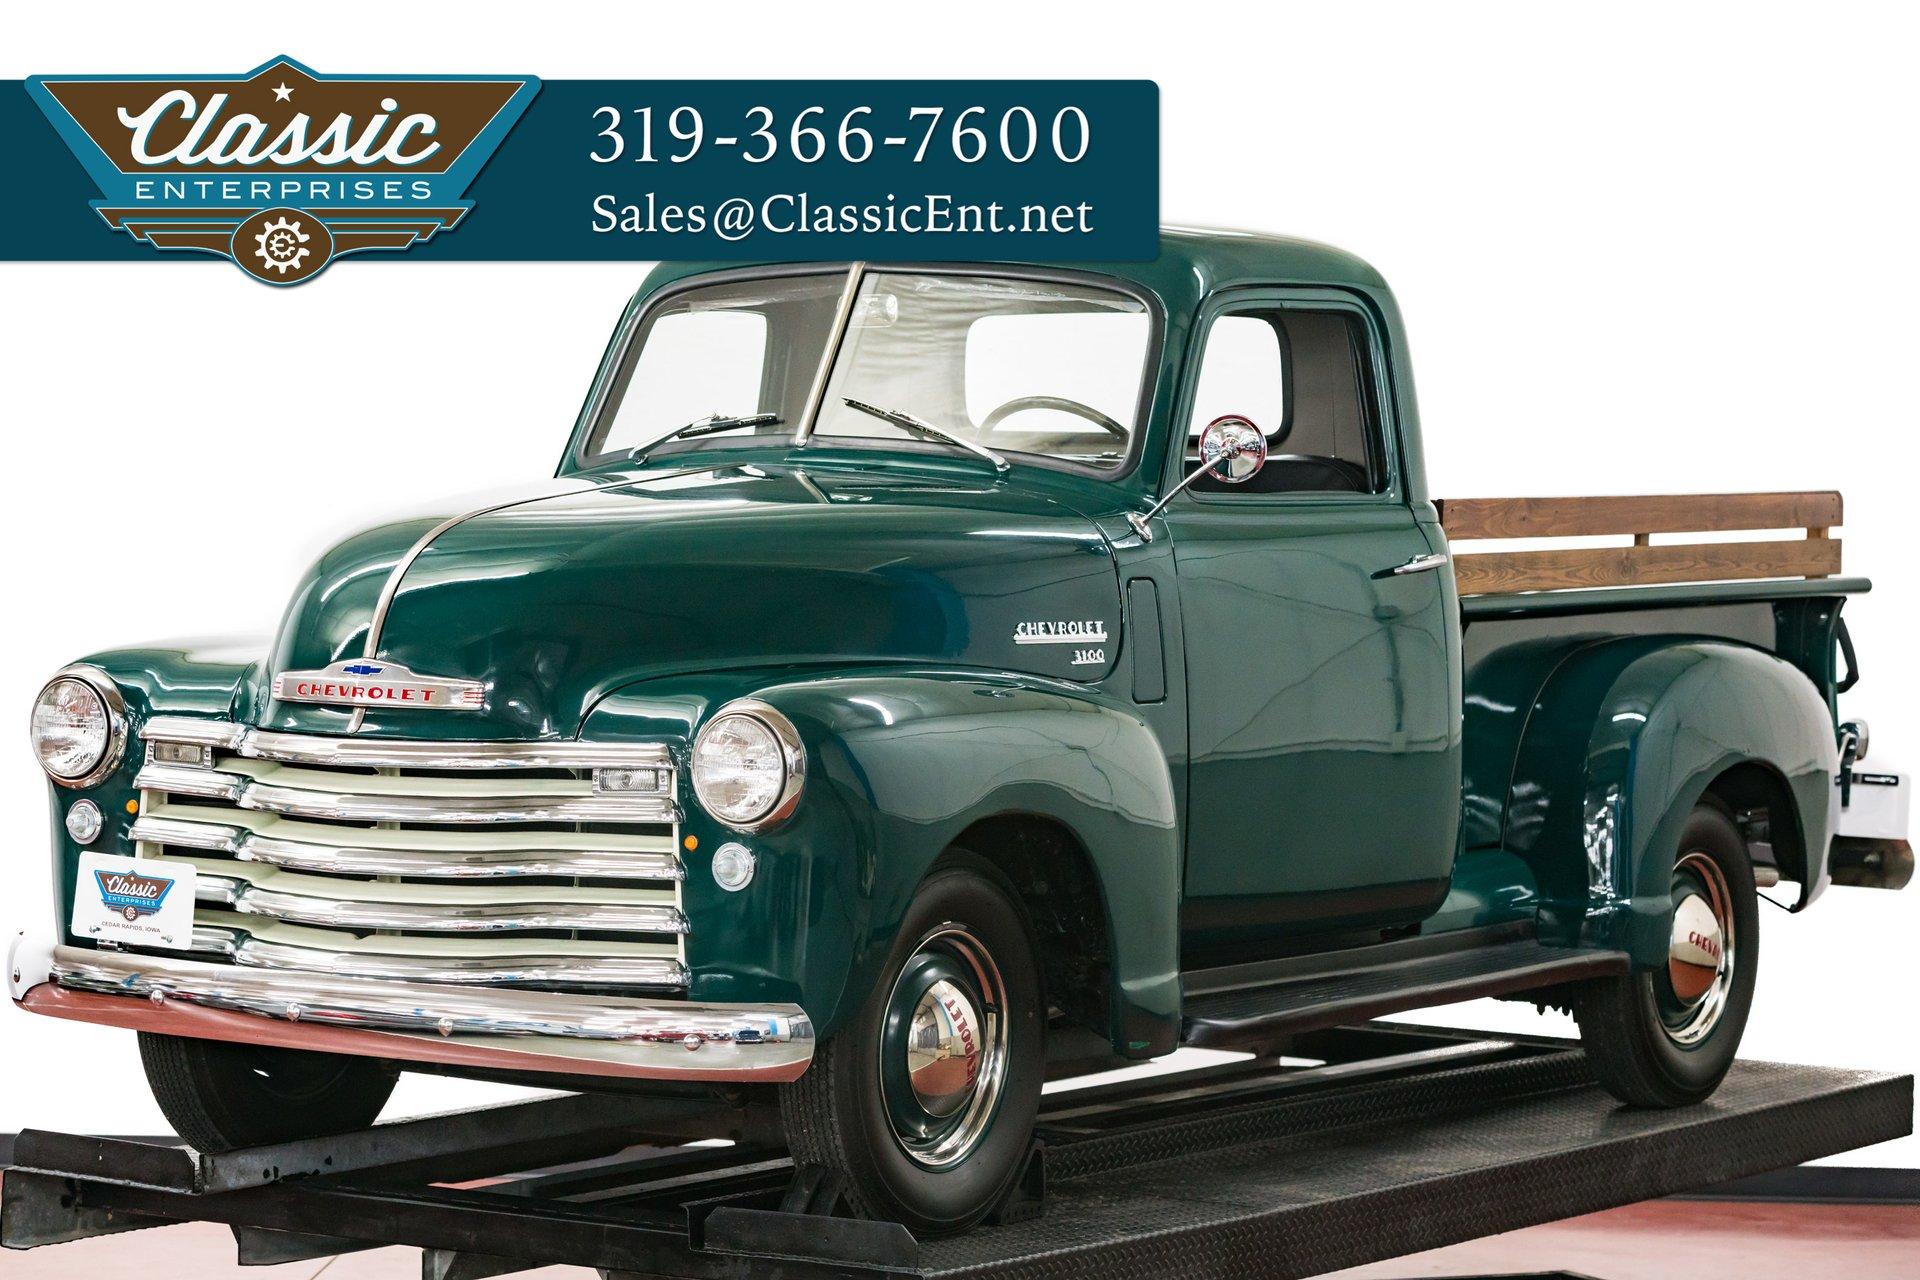 1950 Chevrolet 1-1/2 Ton Pickup